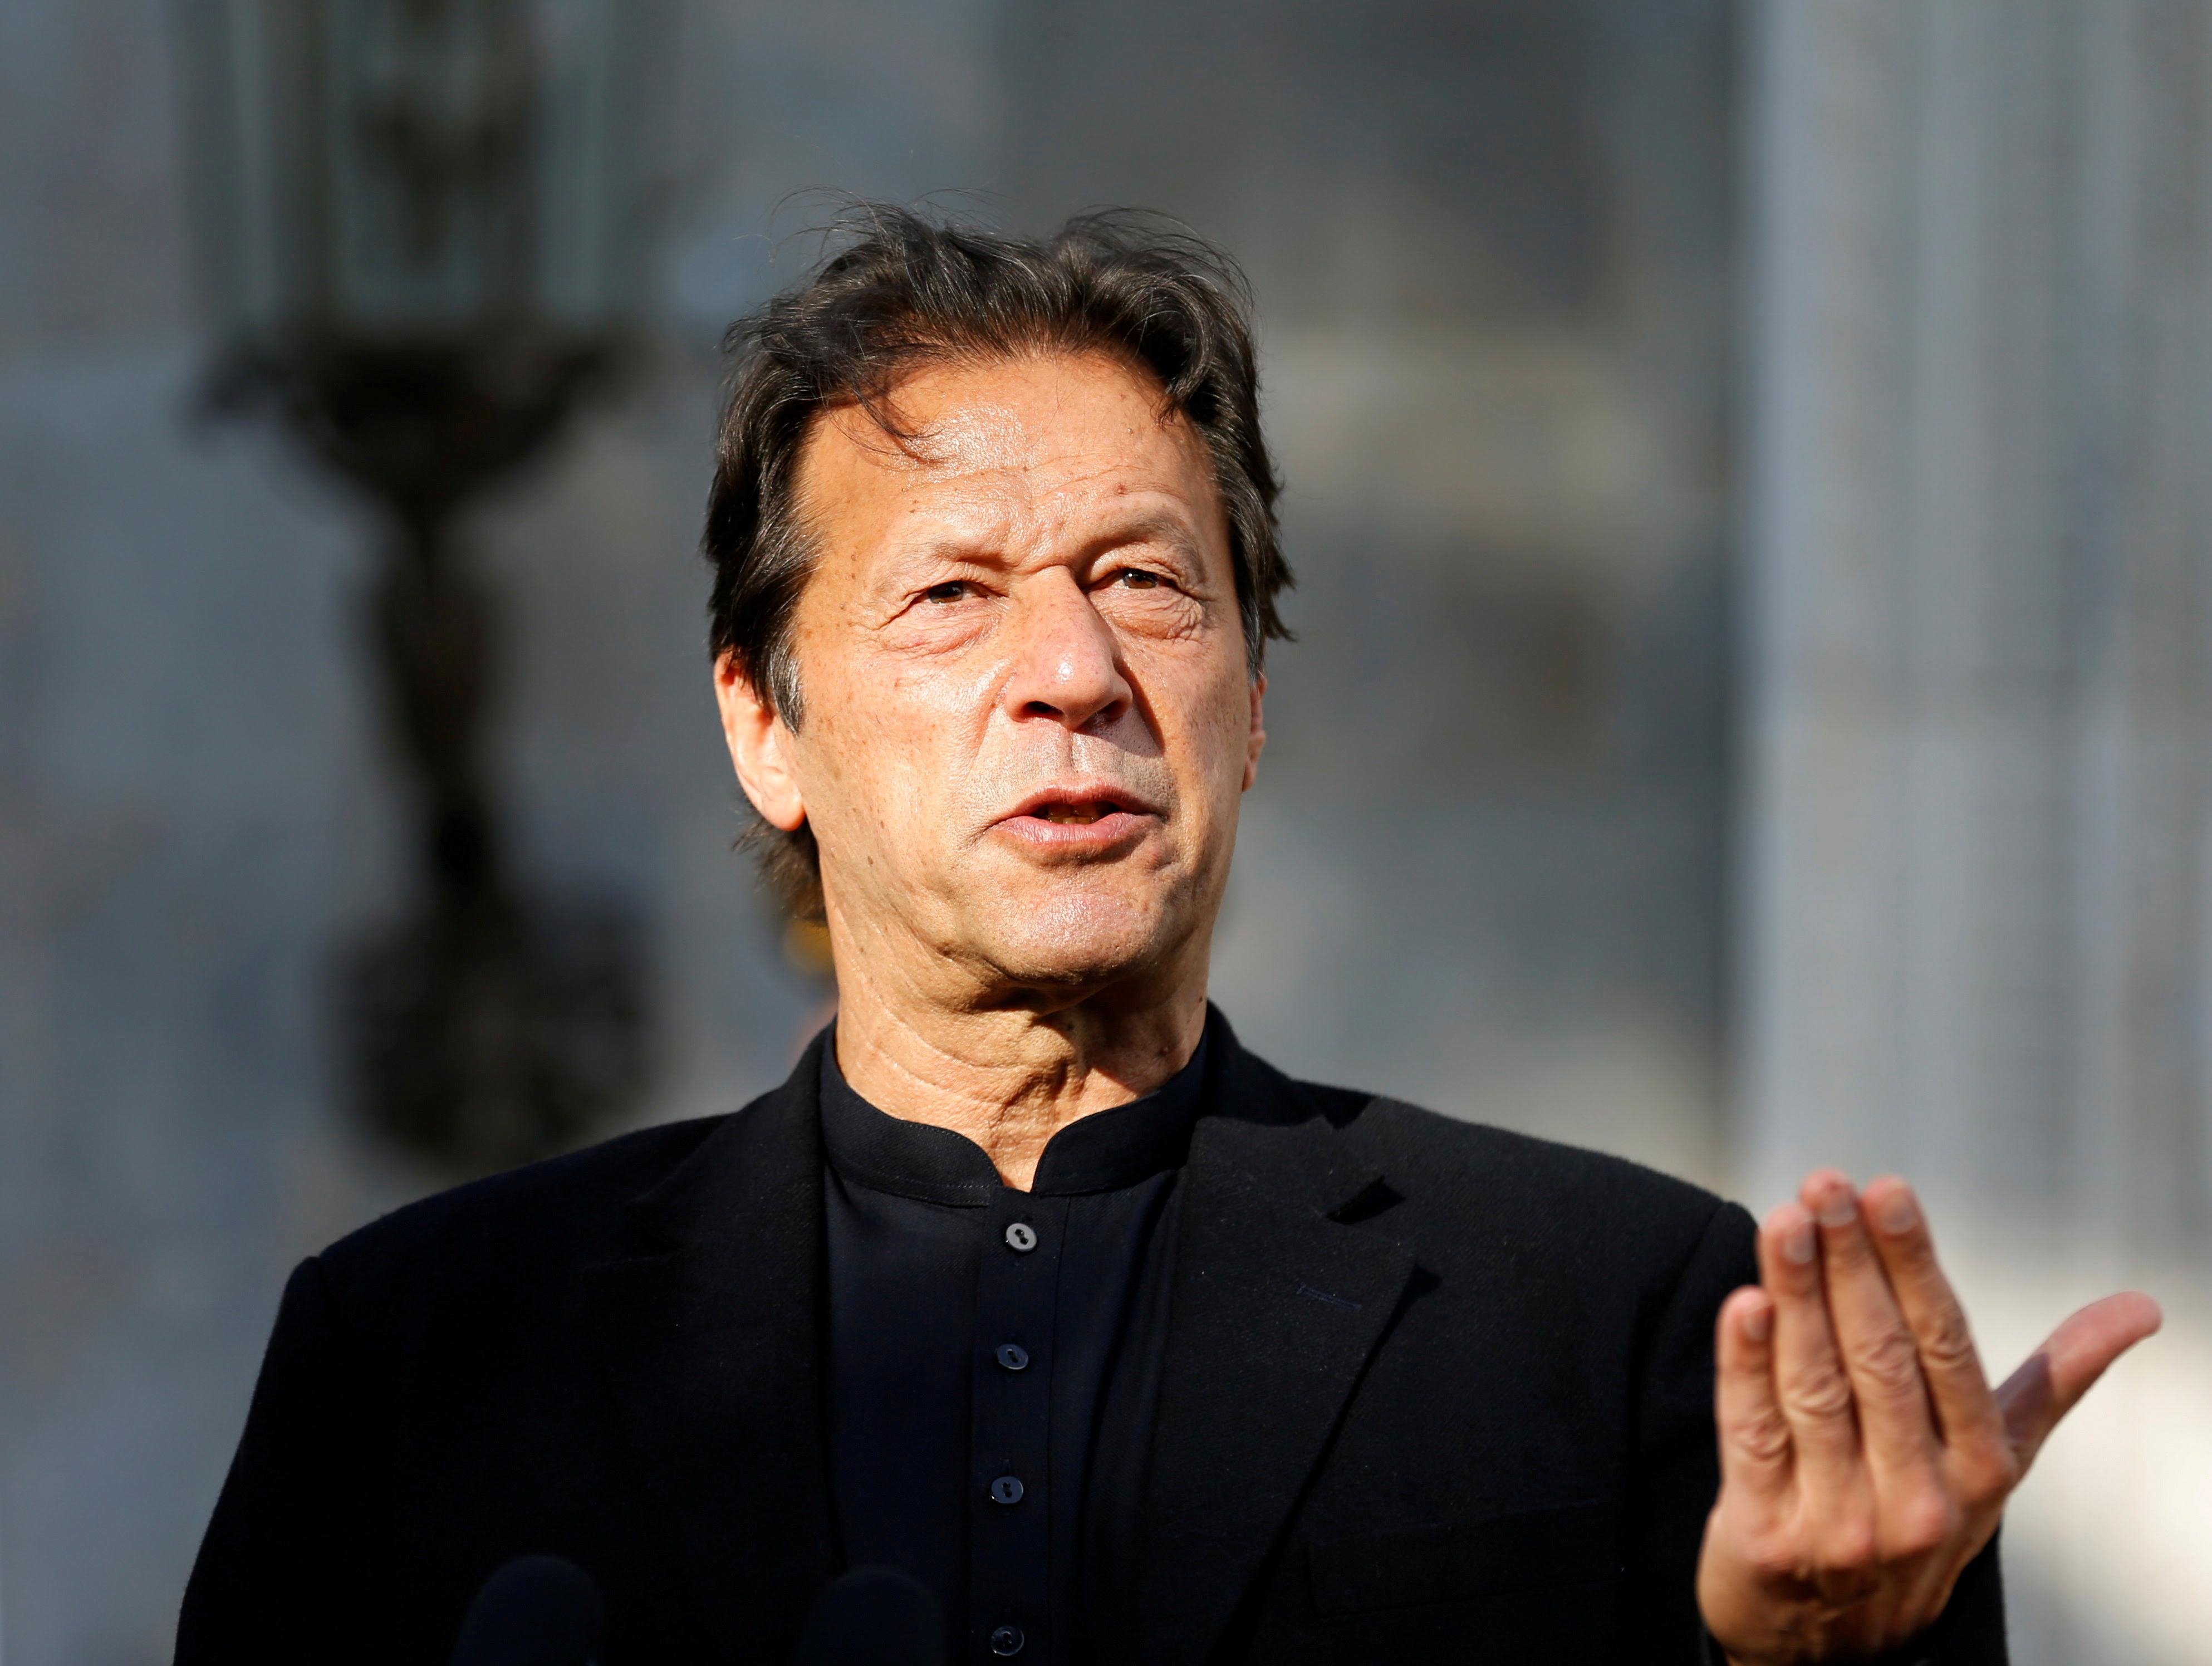 Imran Khan culpou as roupas femininas pelo aumento nos casos de estupro